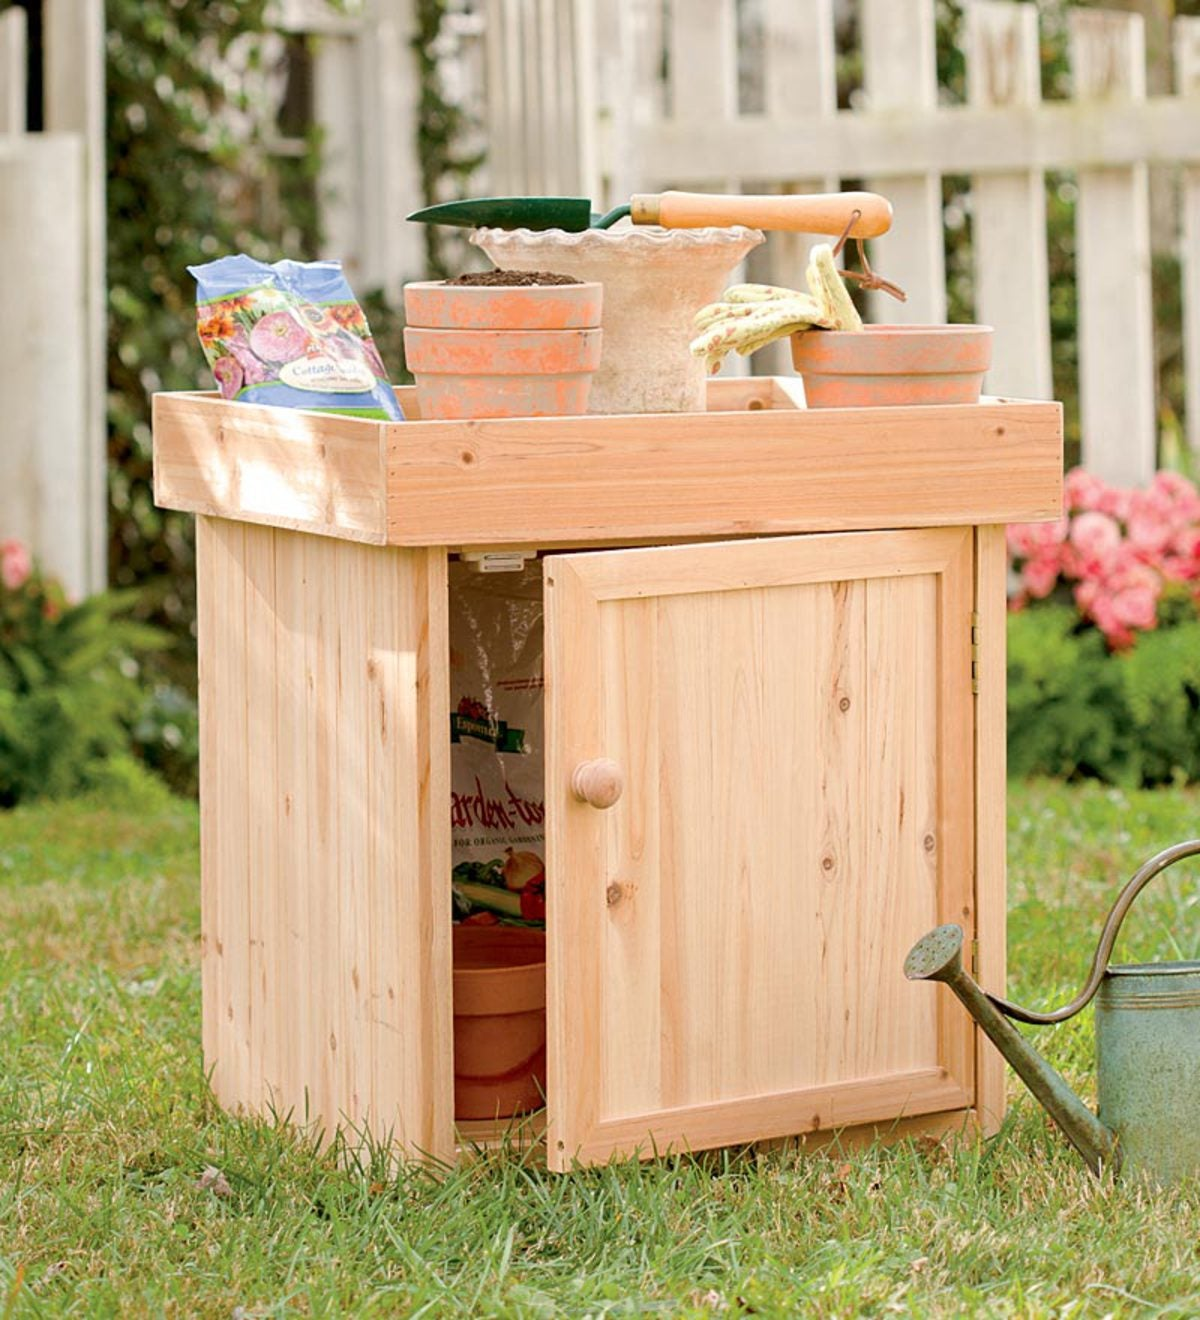 28-Inch Solid Wood Lexington Rectangular Planter Box ...   Unfinished Wood Planter Boxes